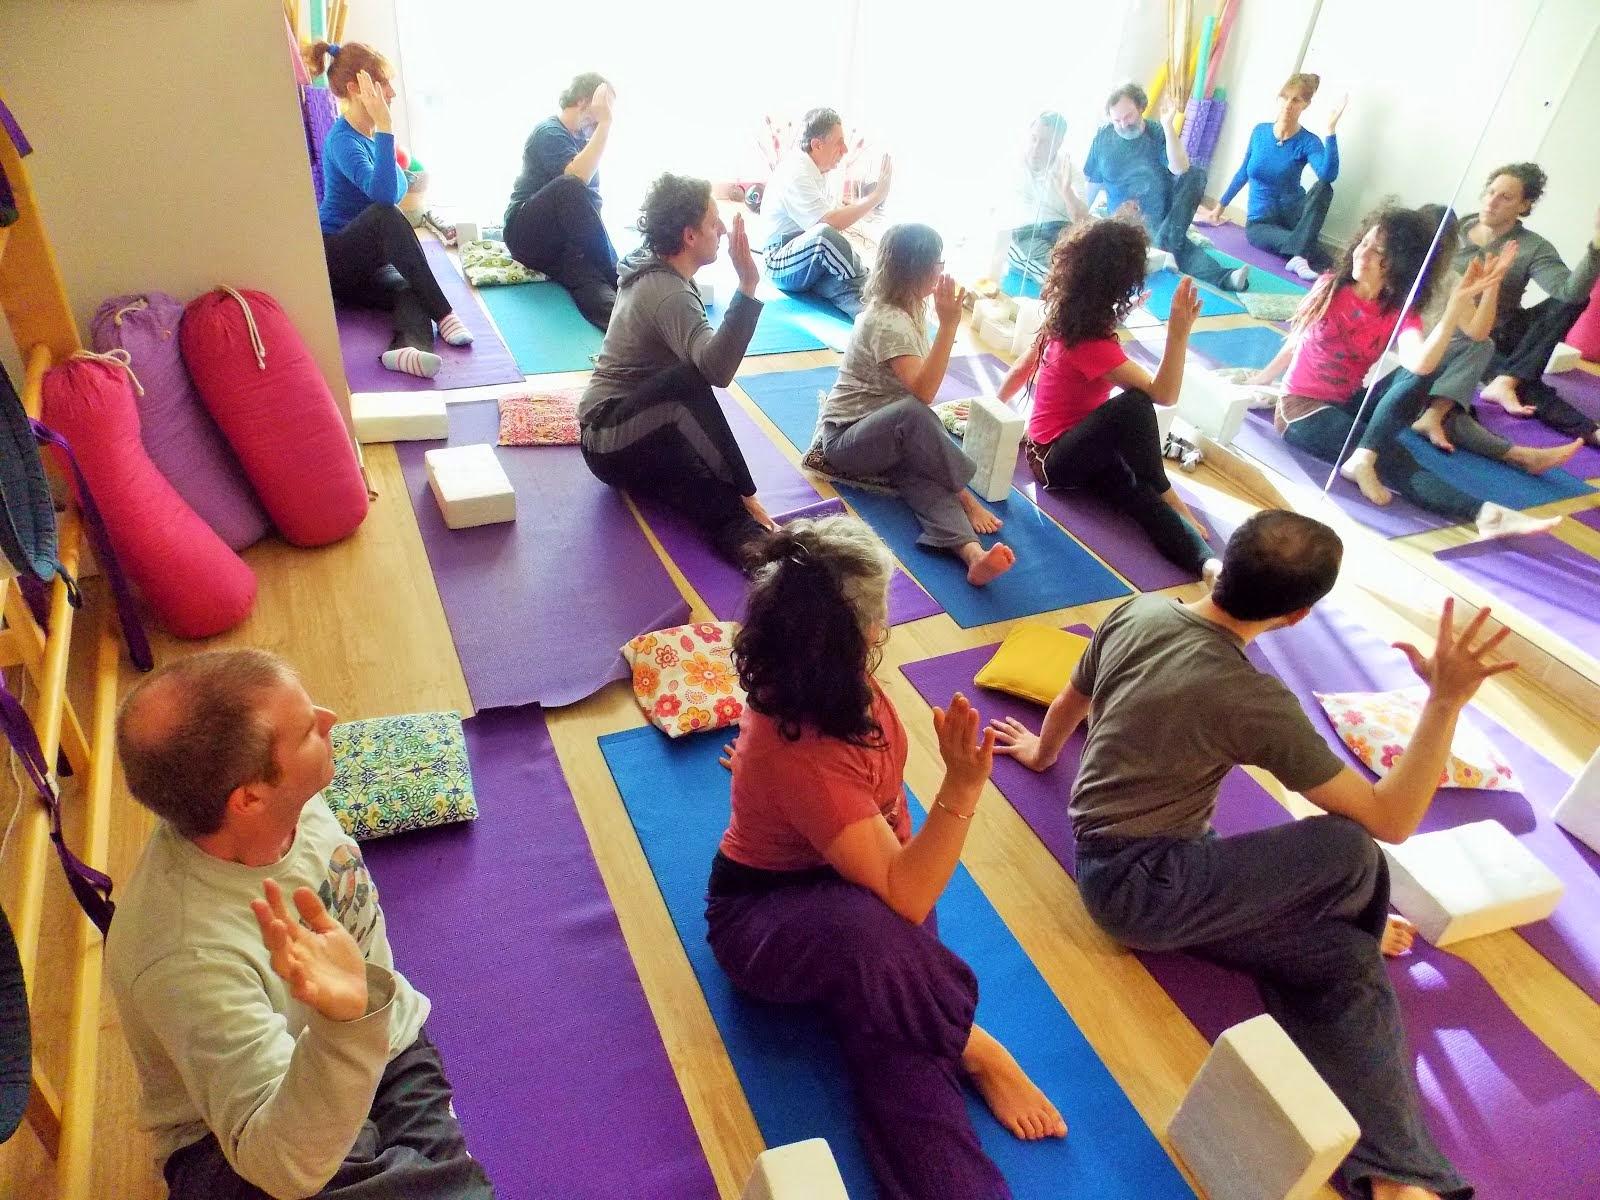 Carrera de Yoga Terapéutico y Terapeuta Oriental.Dra Alejandra Maratea. Lic. Adriana Paoletta